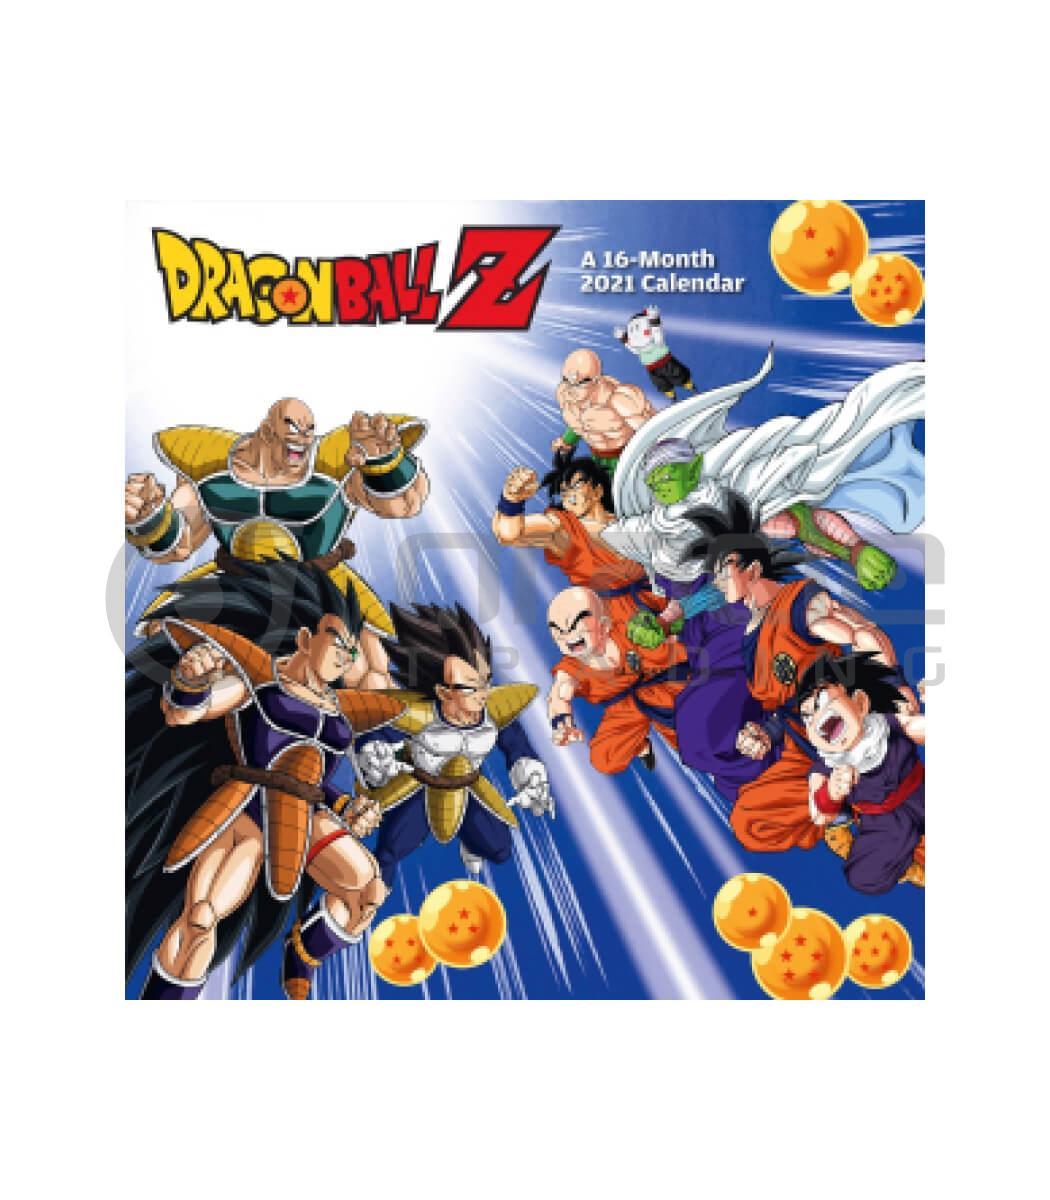 Dragon Ball Super 2022 Calendar (OCT Delivery)